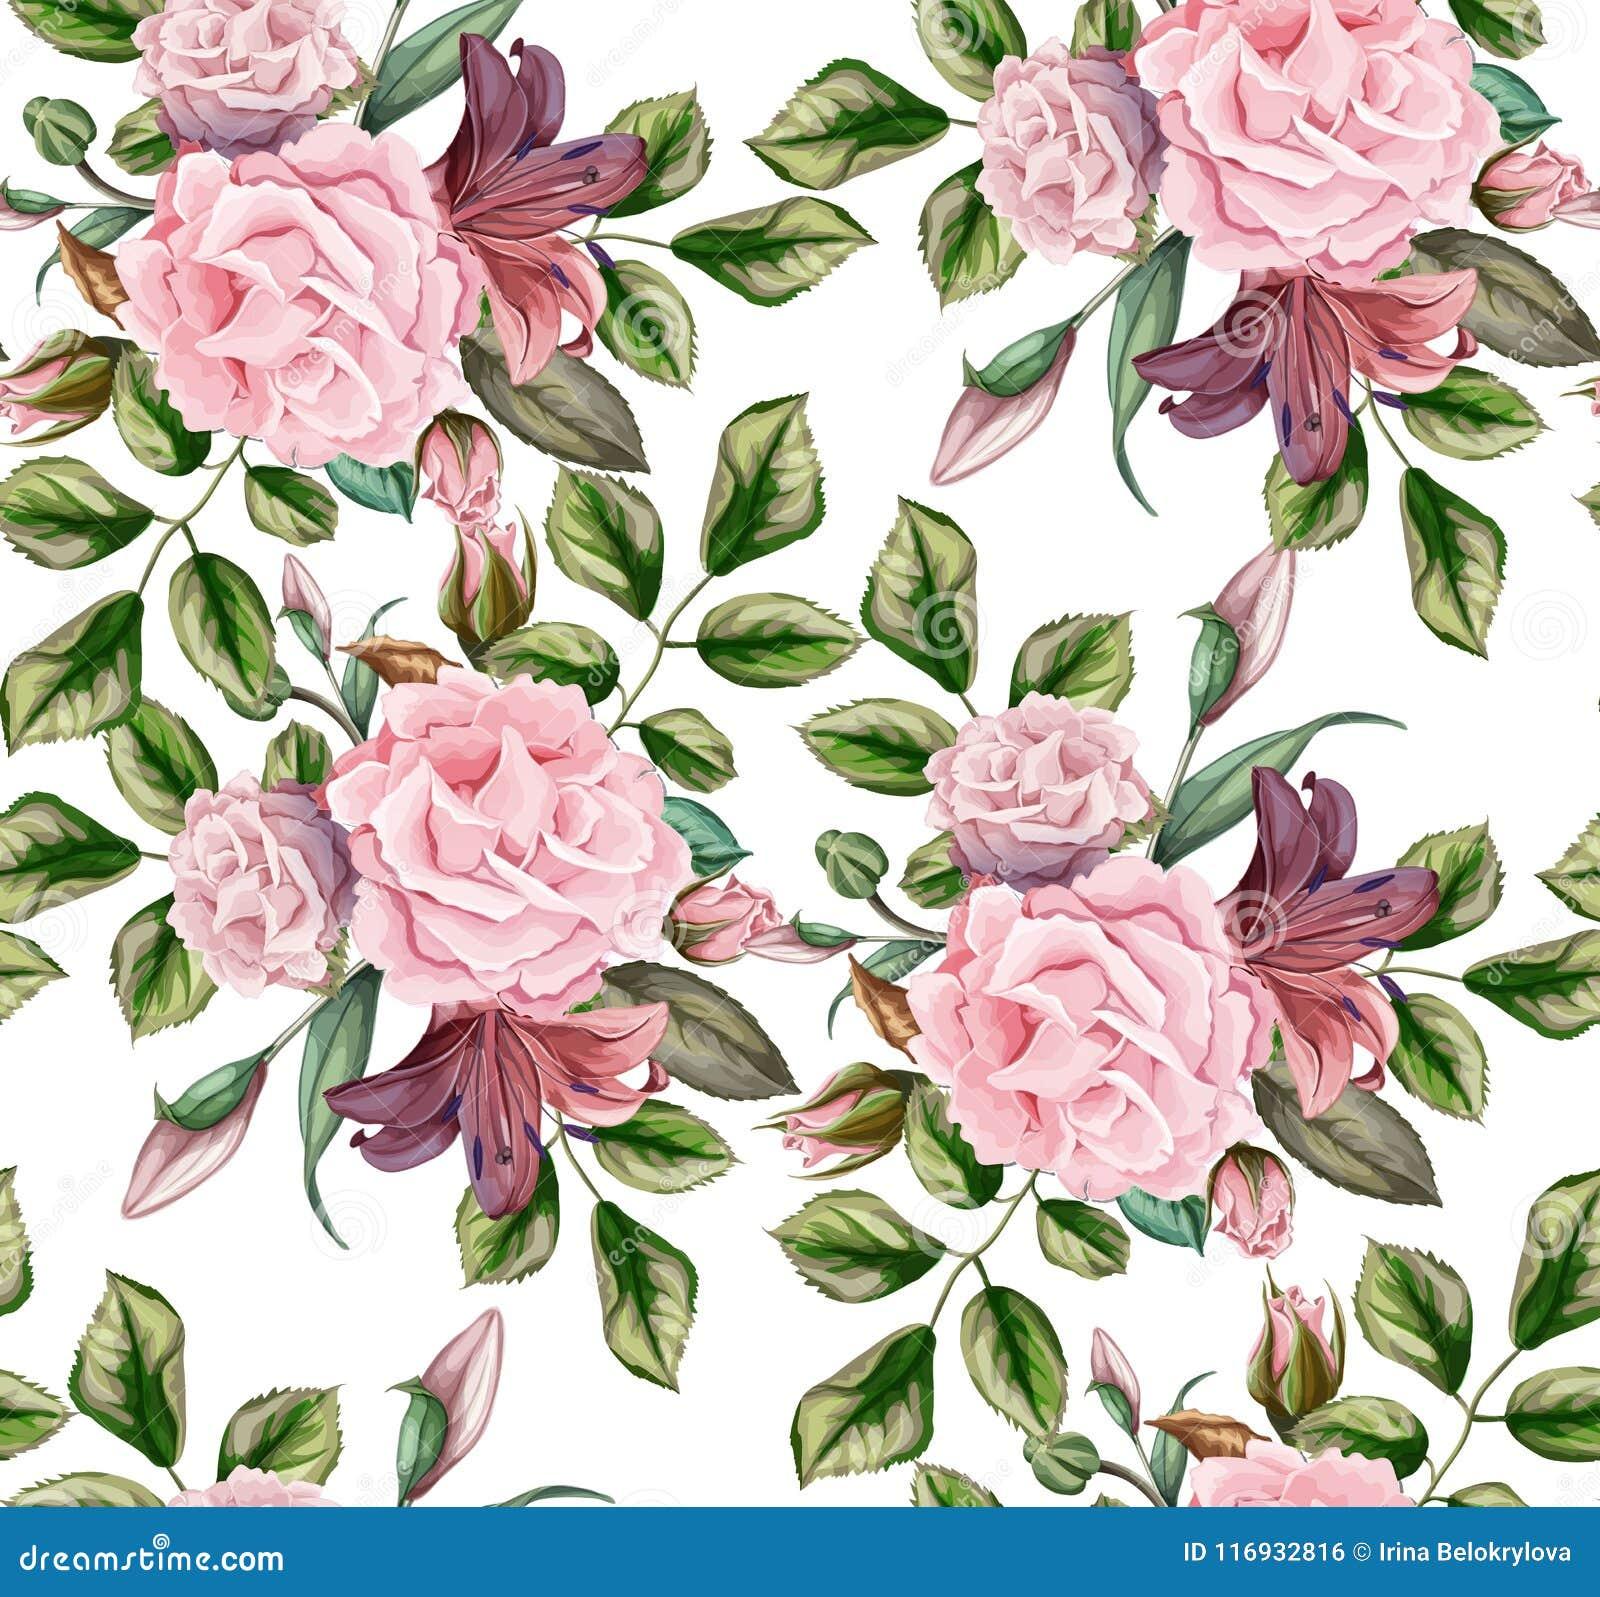 Blumenblüten-Blattes des Vektors nahtloses Muster des rosafarbenen